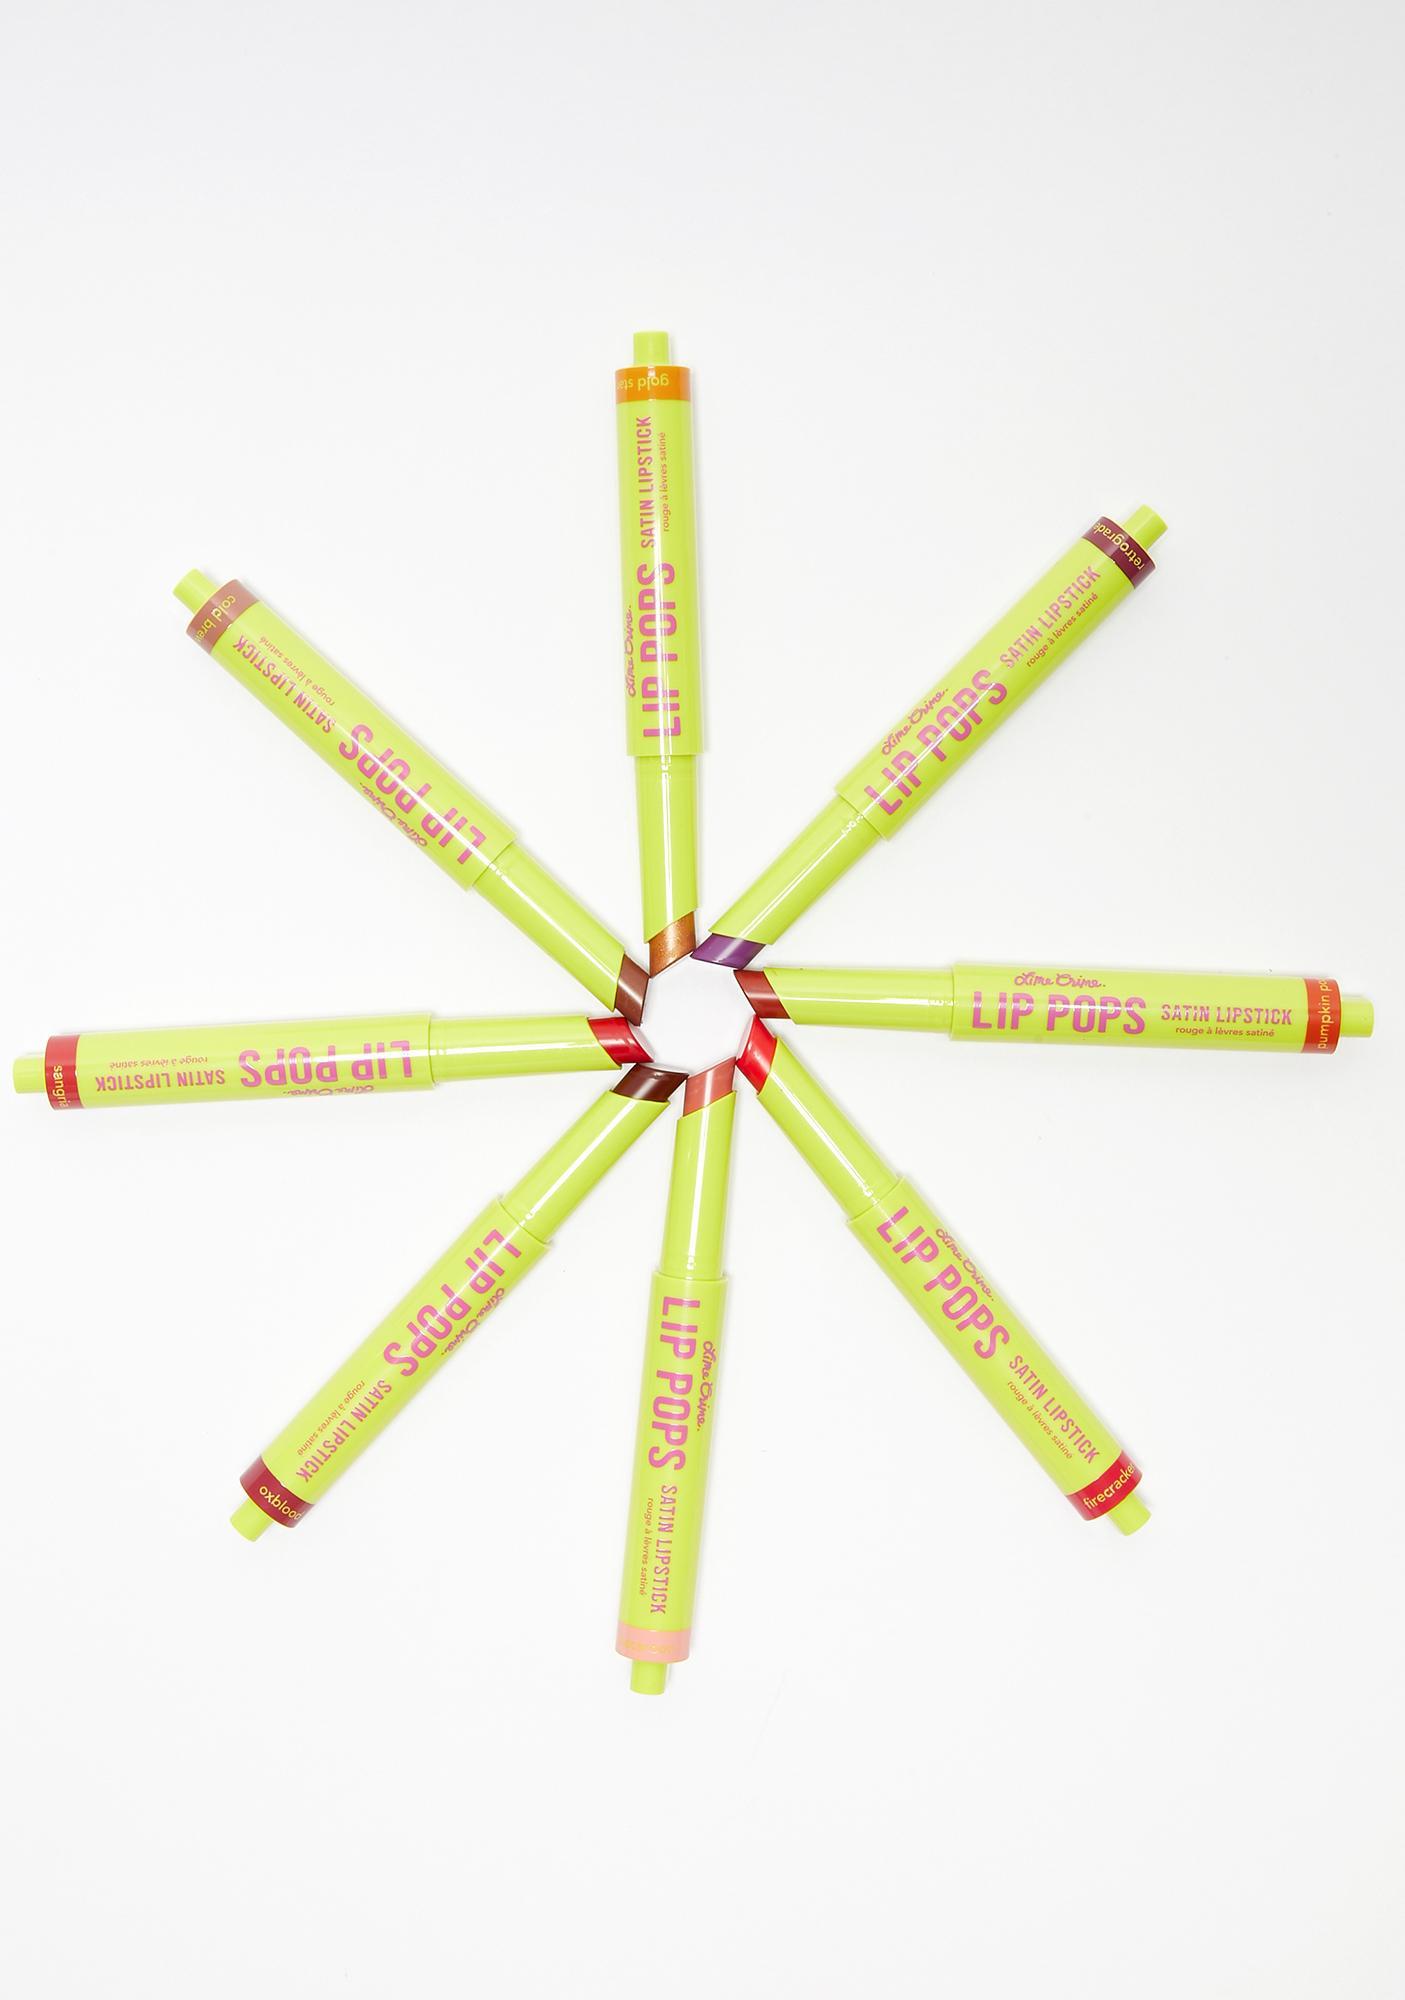 Lime Crime Oxblood Lip Pops Satin Lipstick